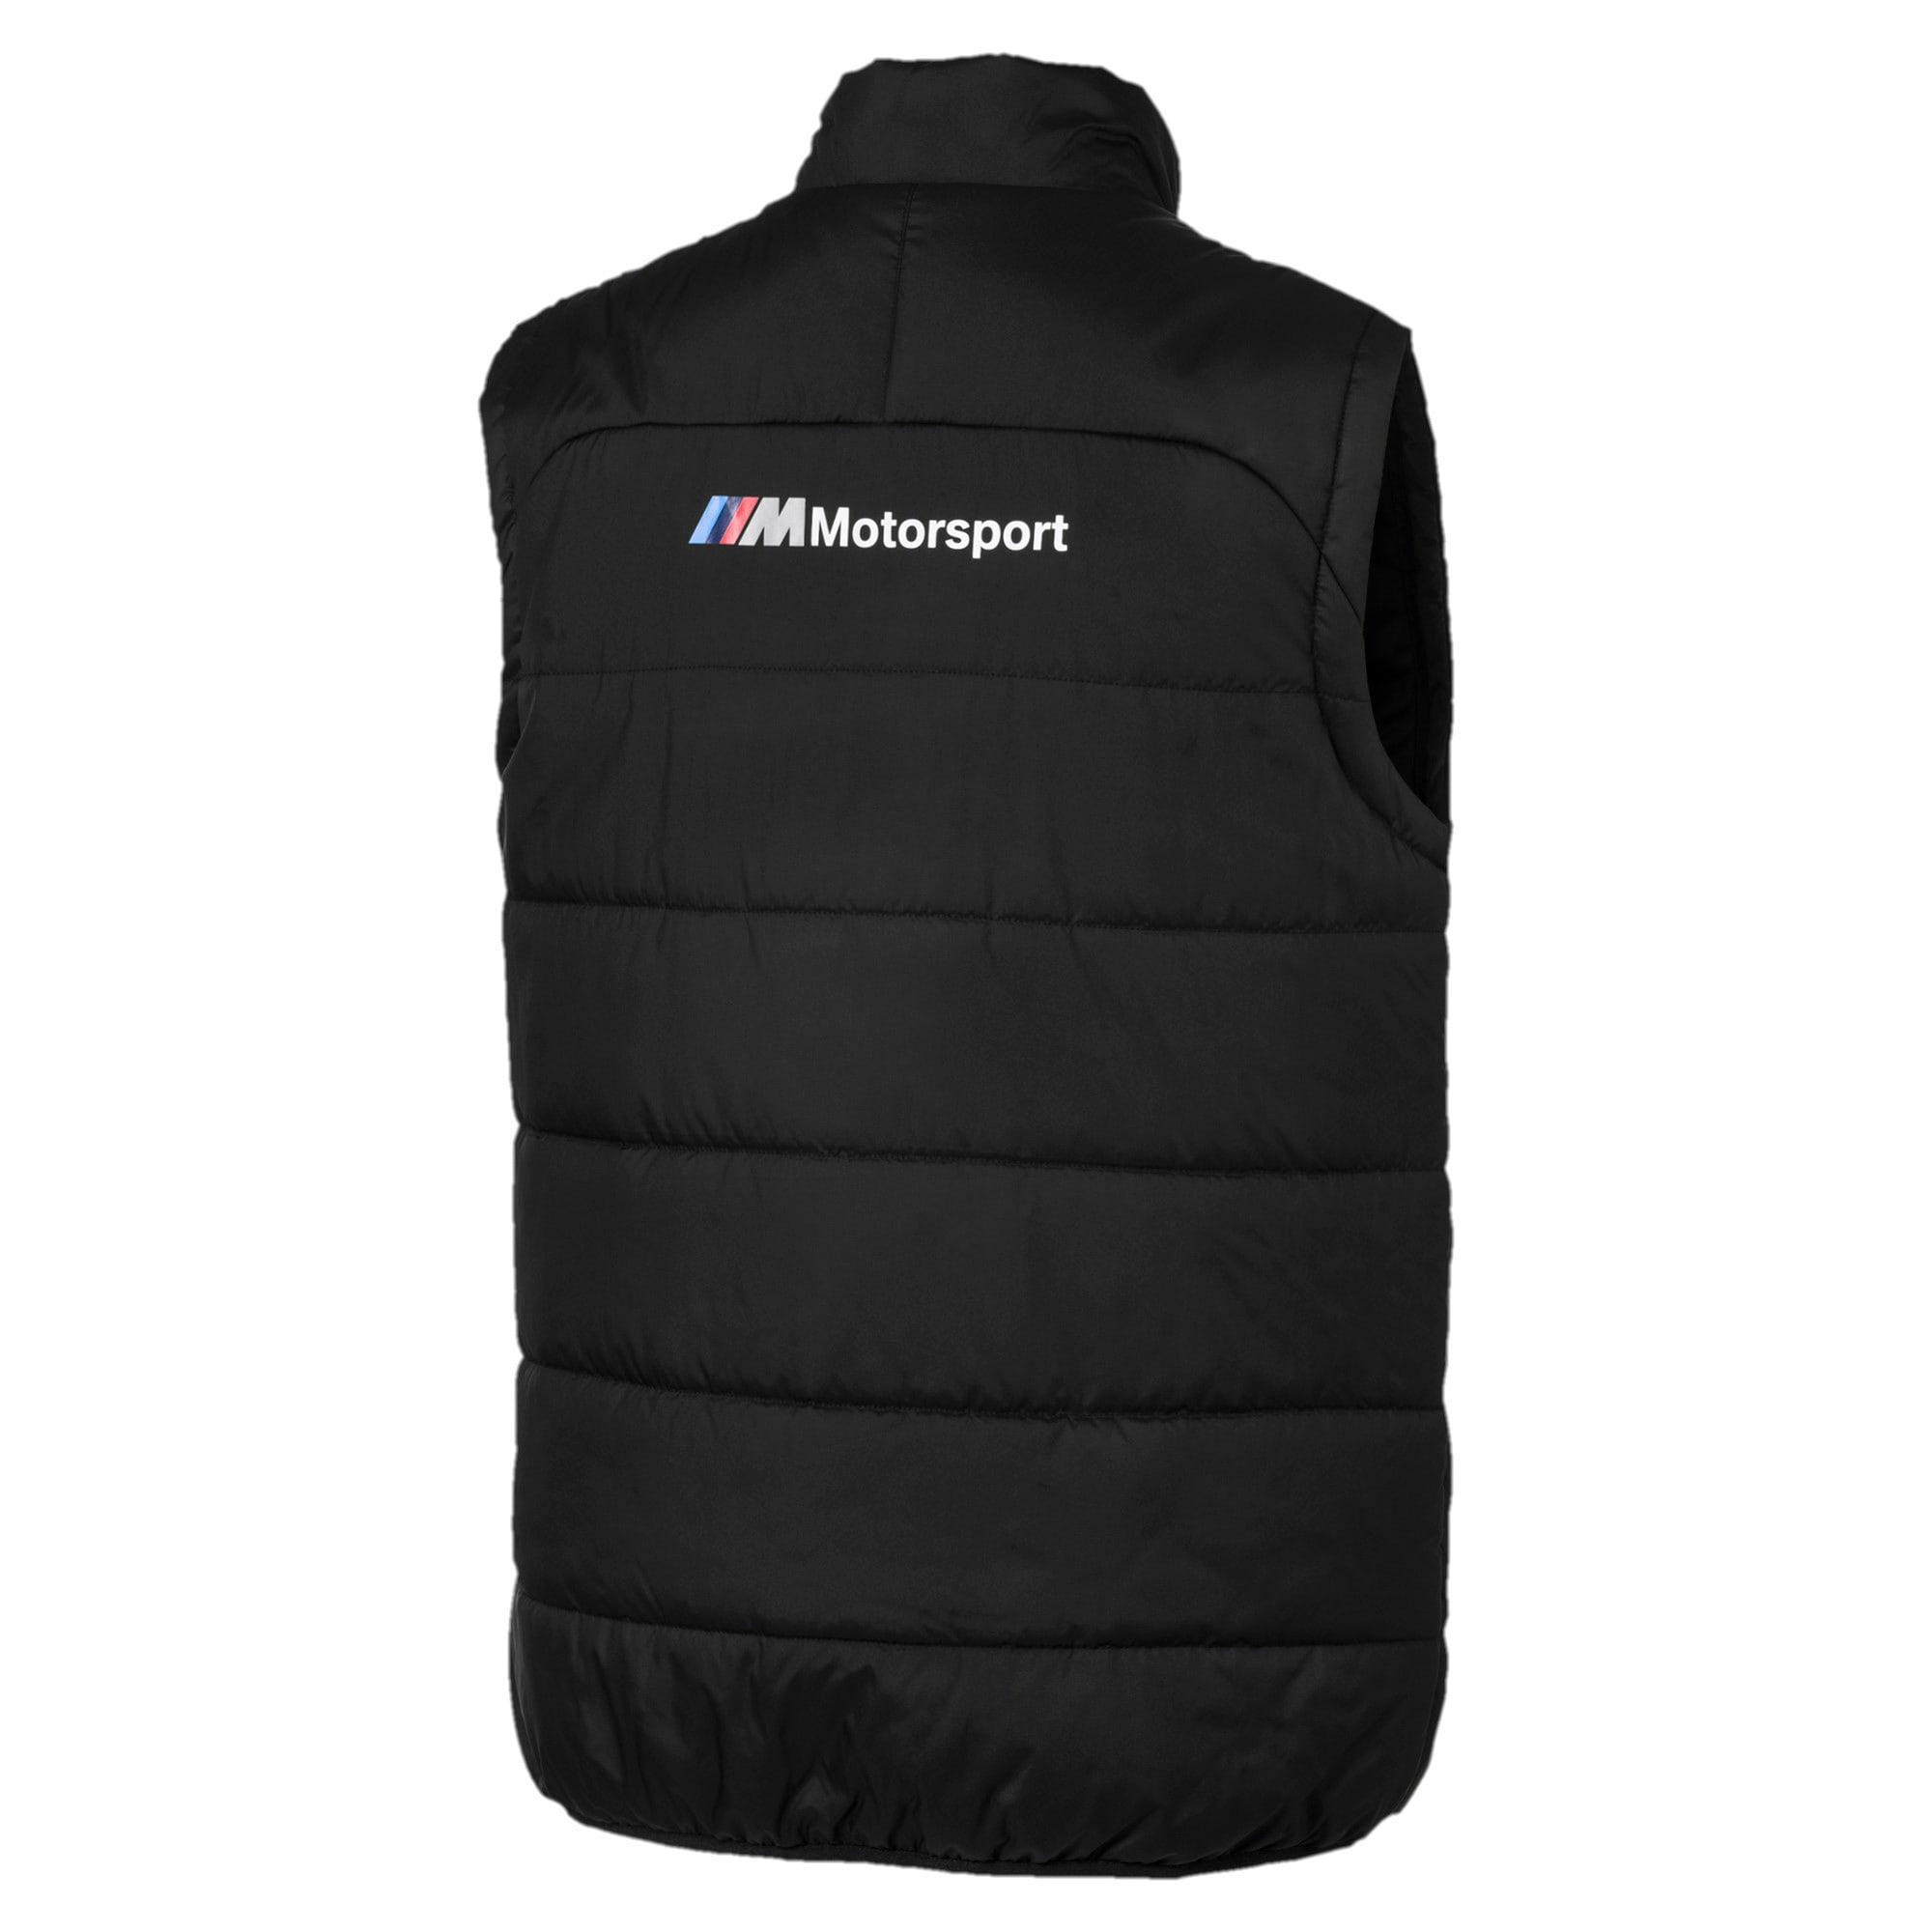 Thumbnail 6 of BMW M Motorsports Men's Padded Vest, Puma Black, medium